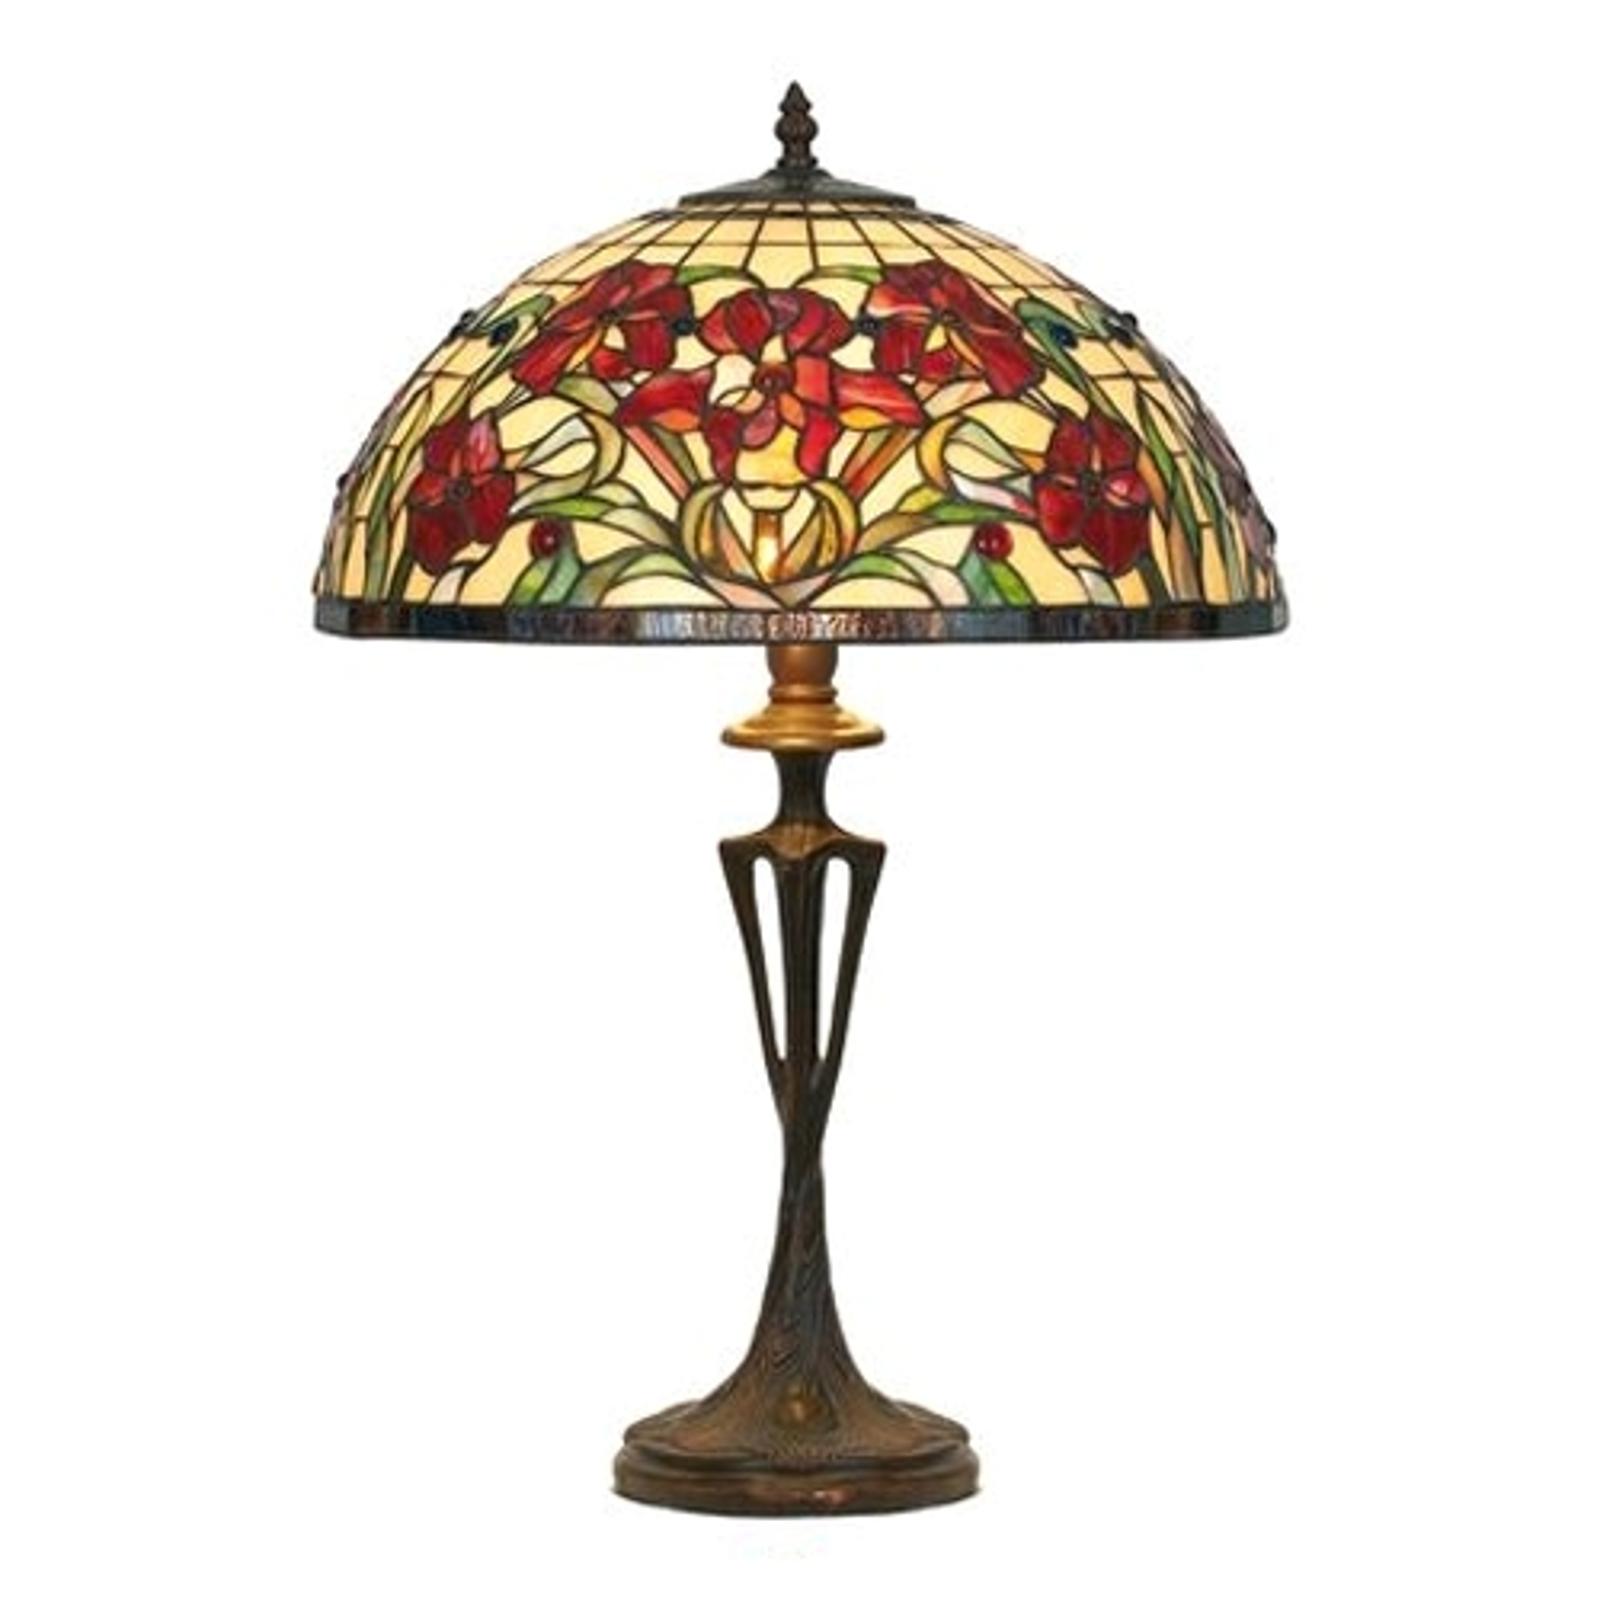 Tiffany style table lamp Eline_1032171_1